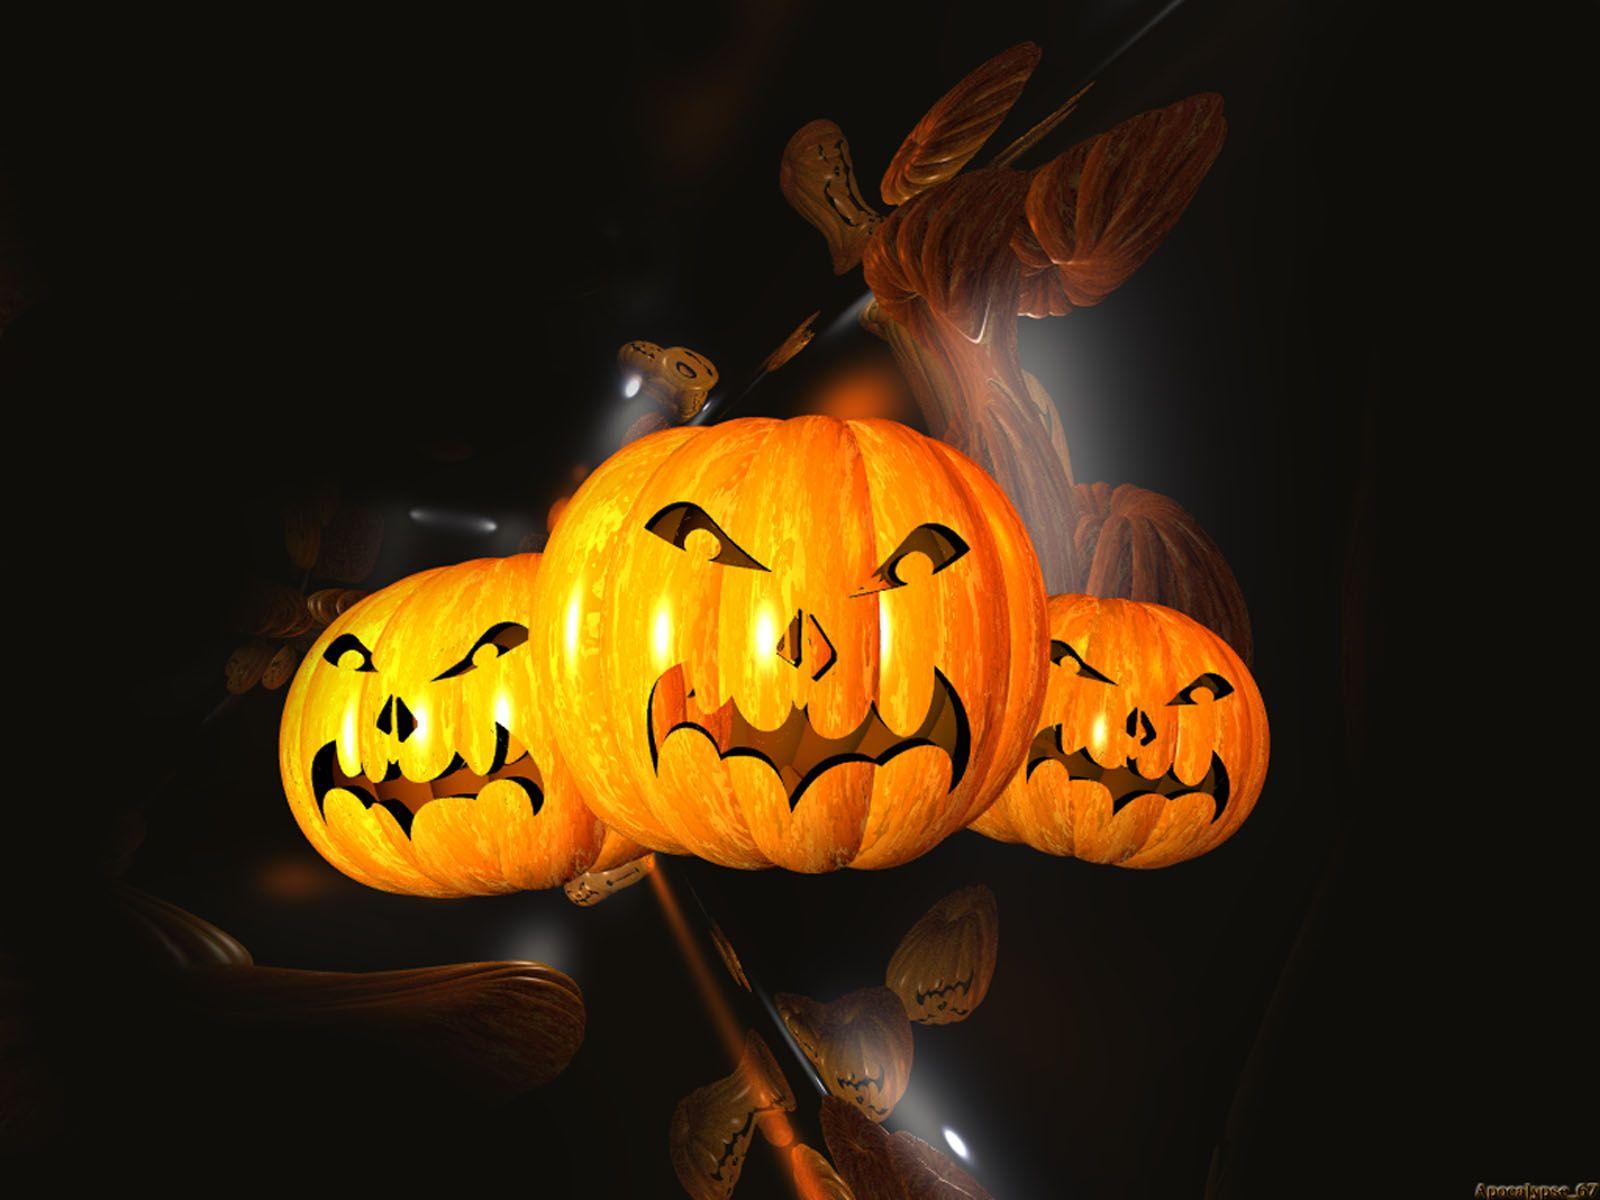 Halloween Halloween wallpaper, Scary halloween pumpkins